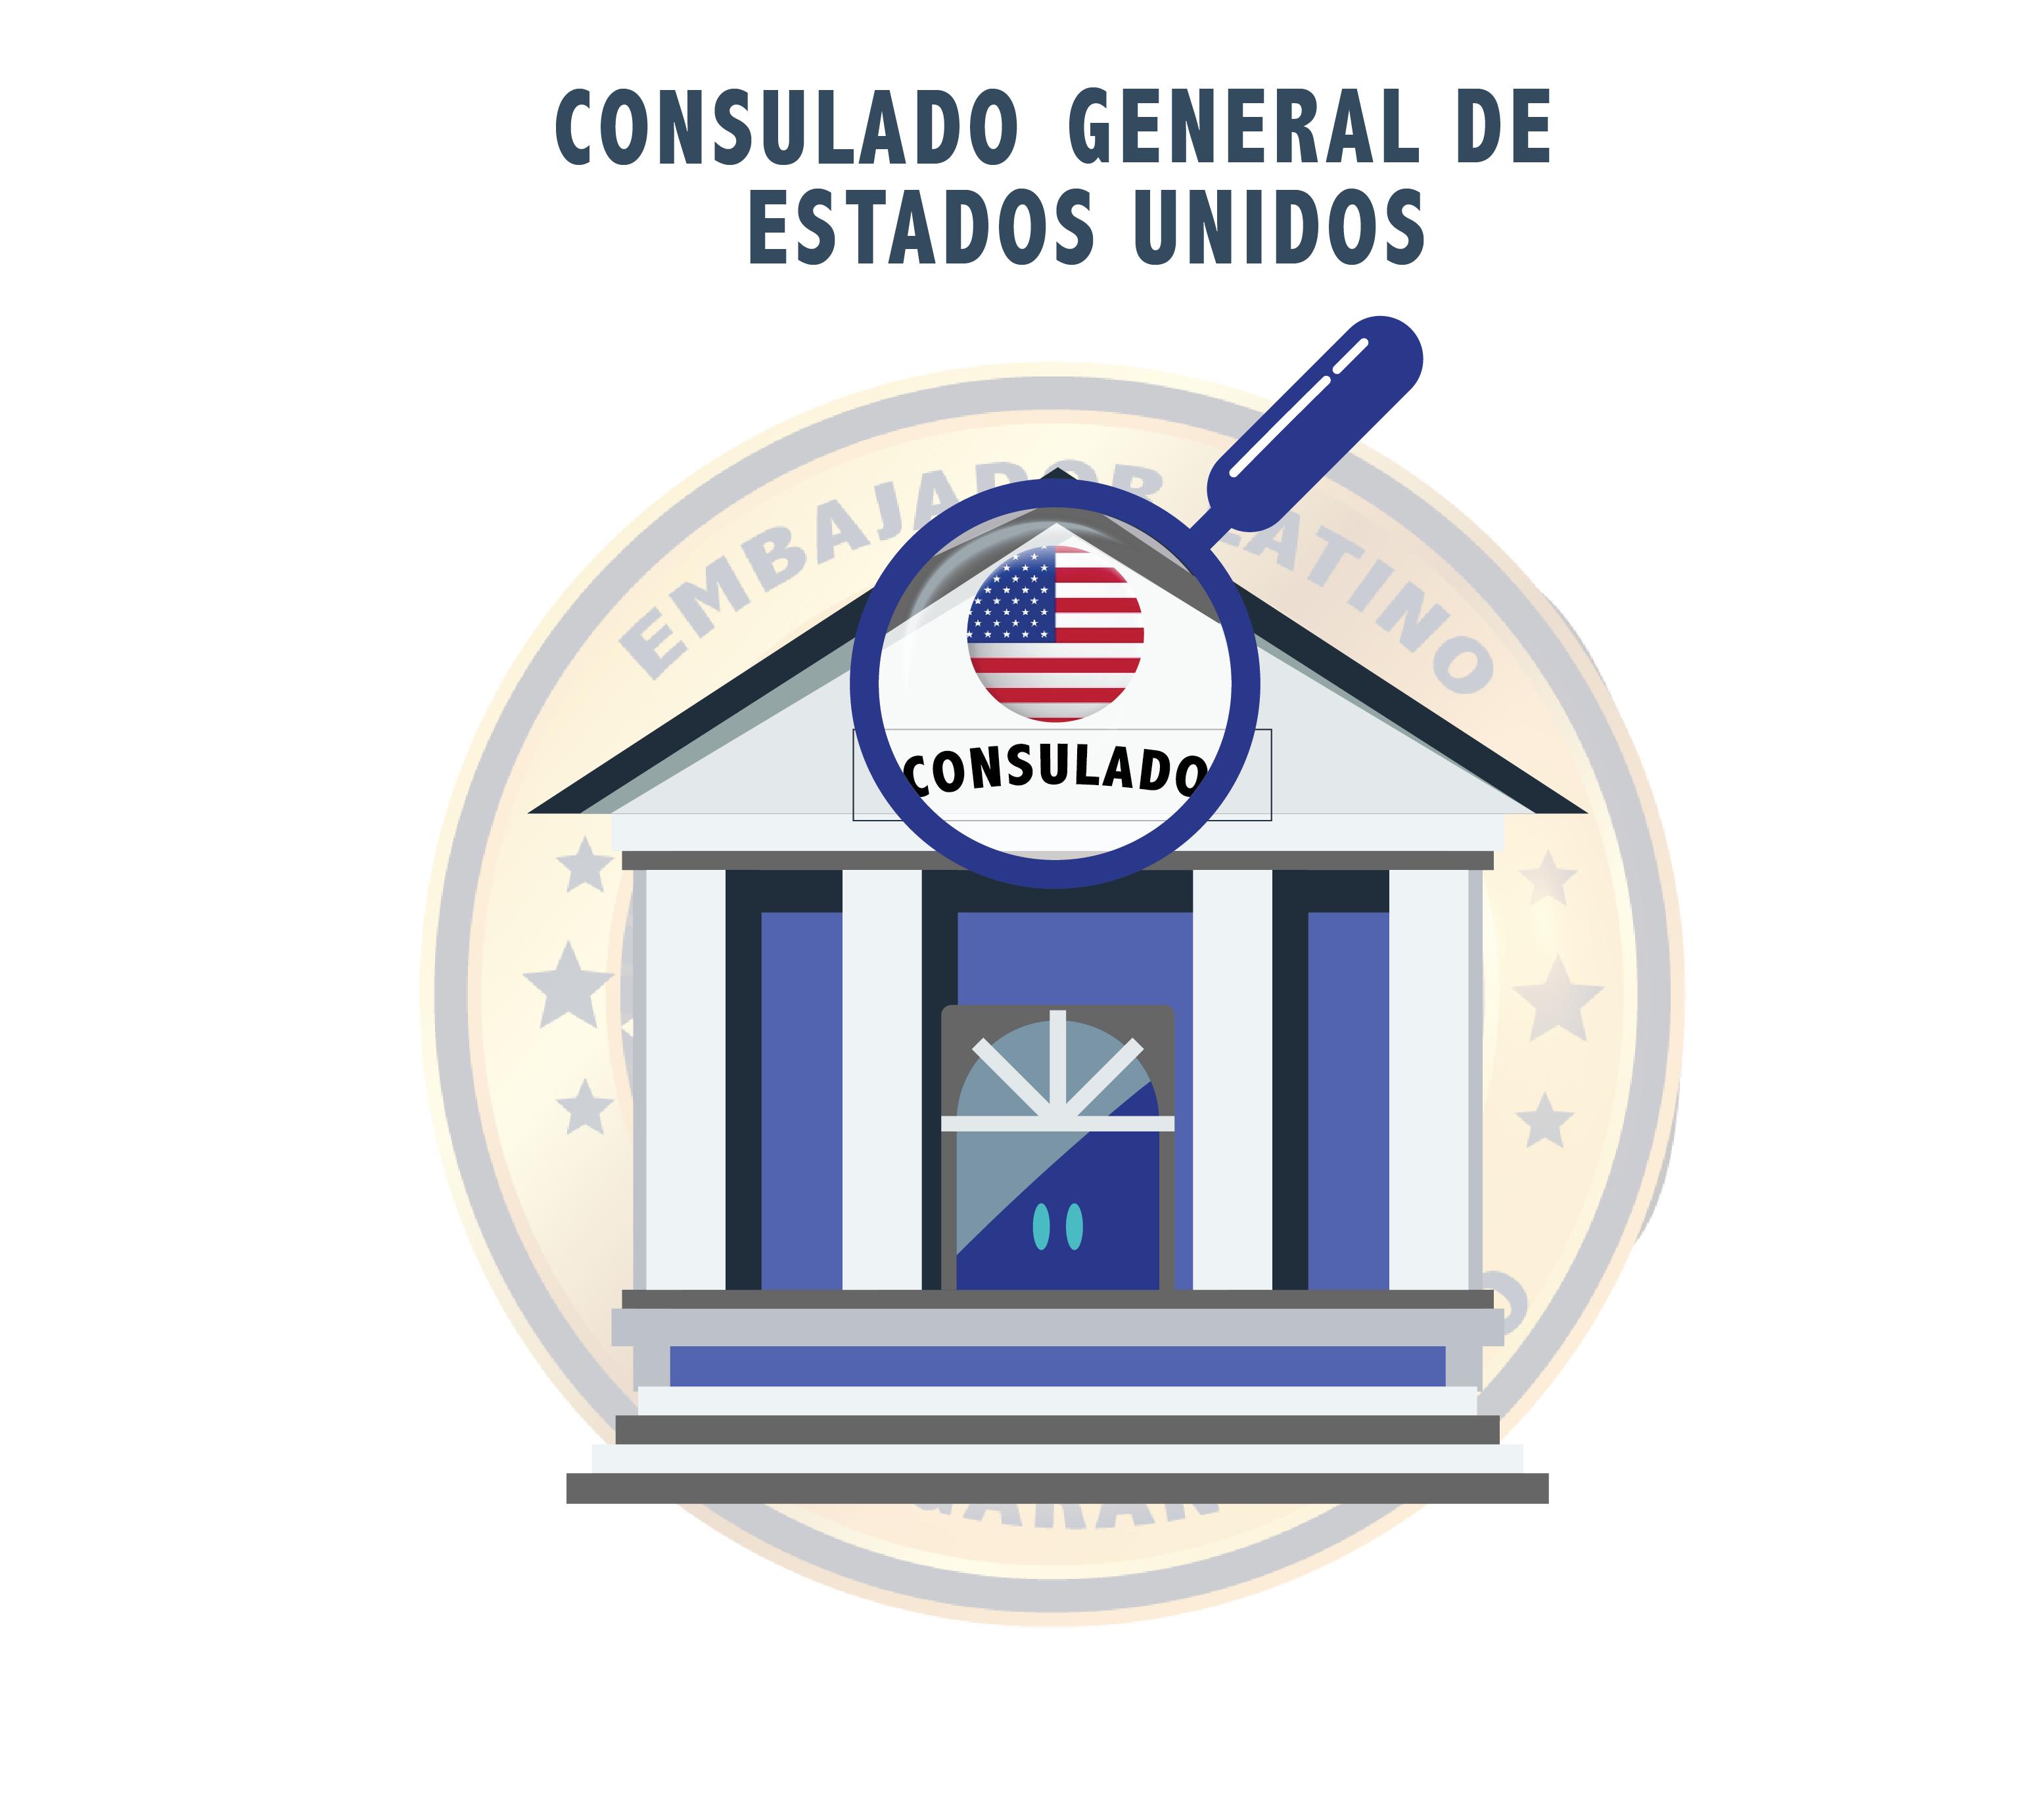 American Consulate General